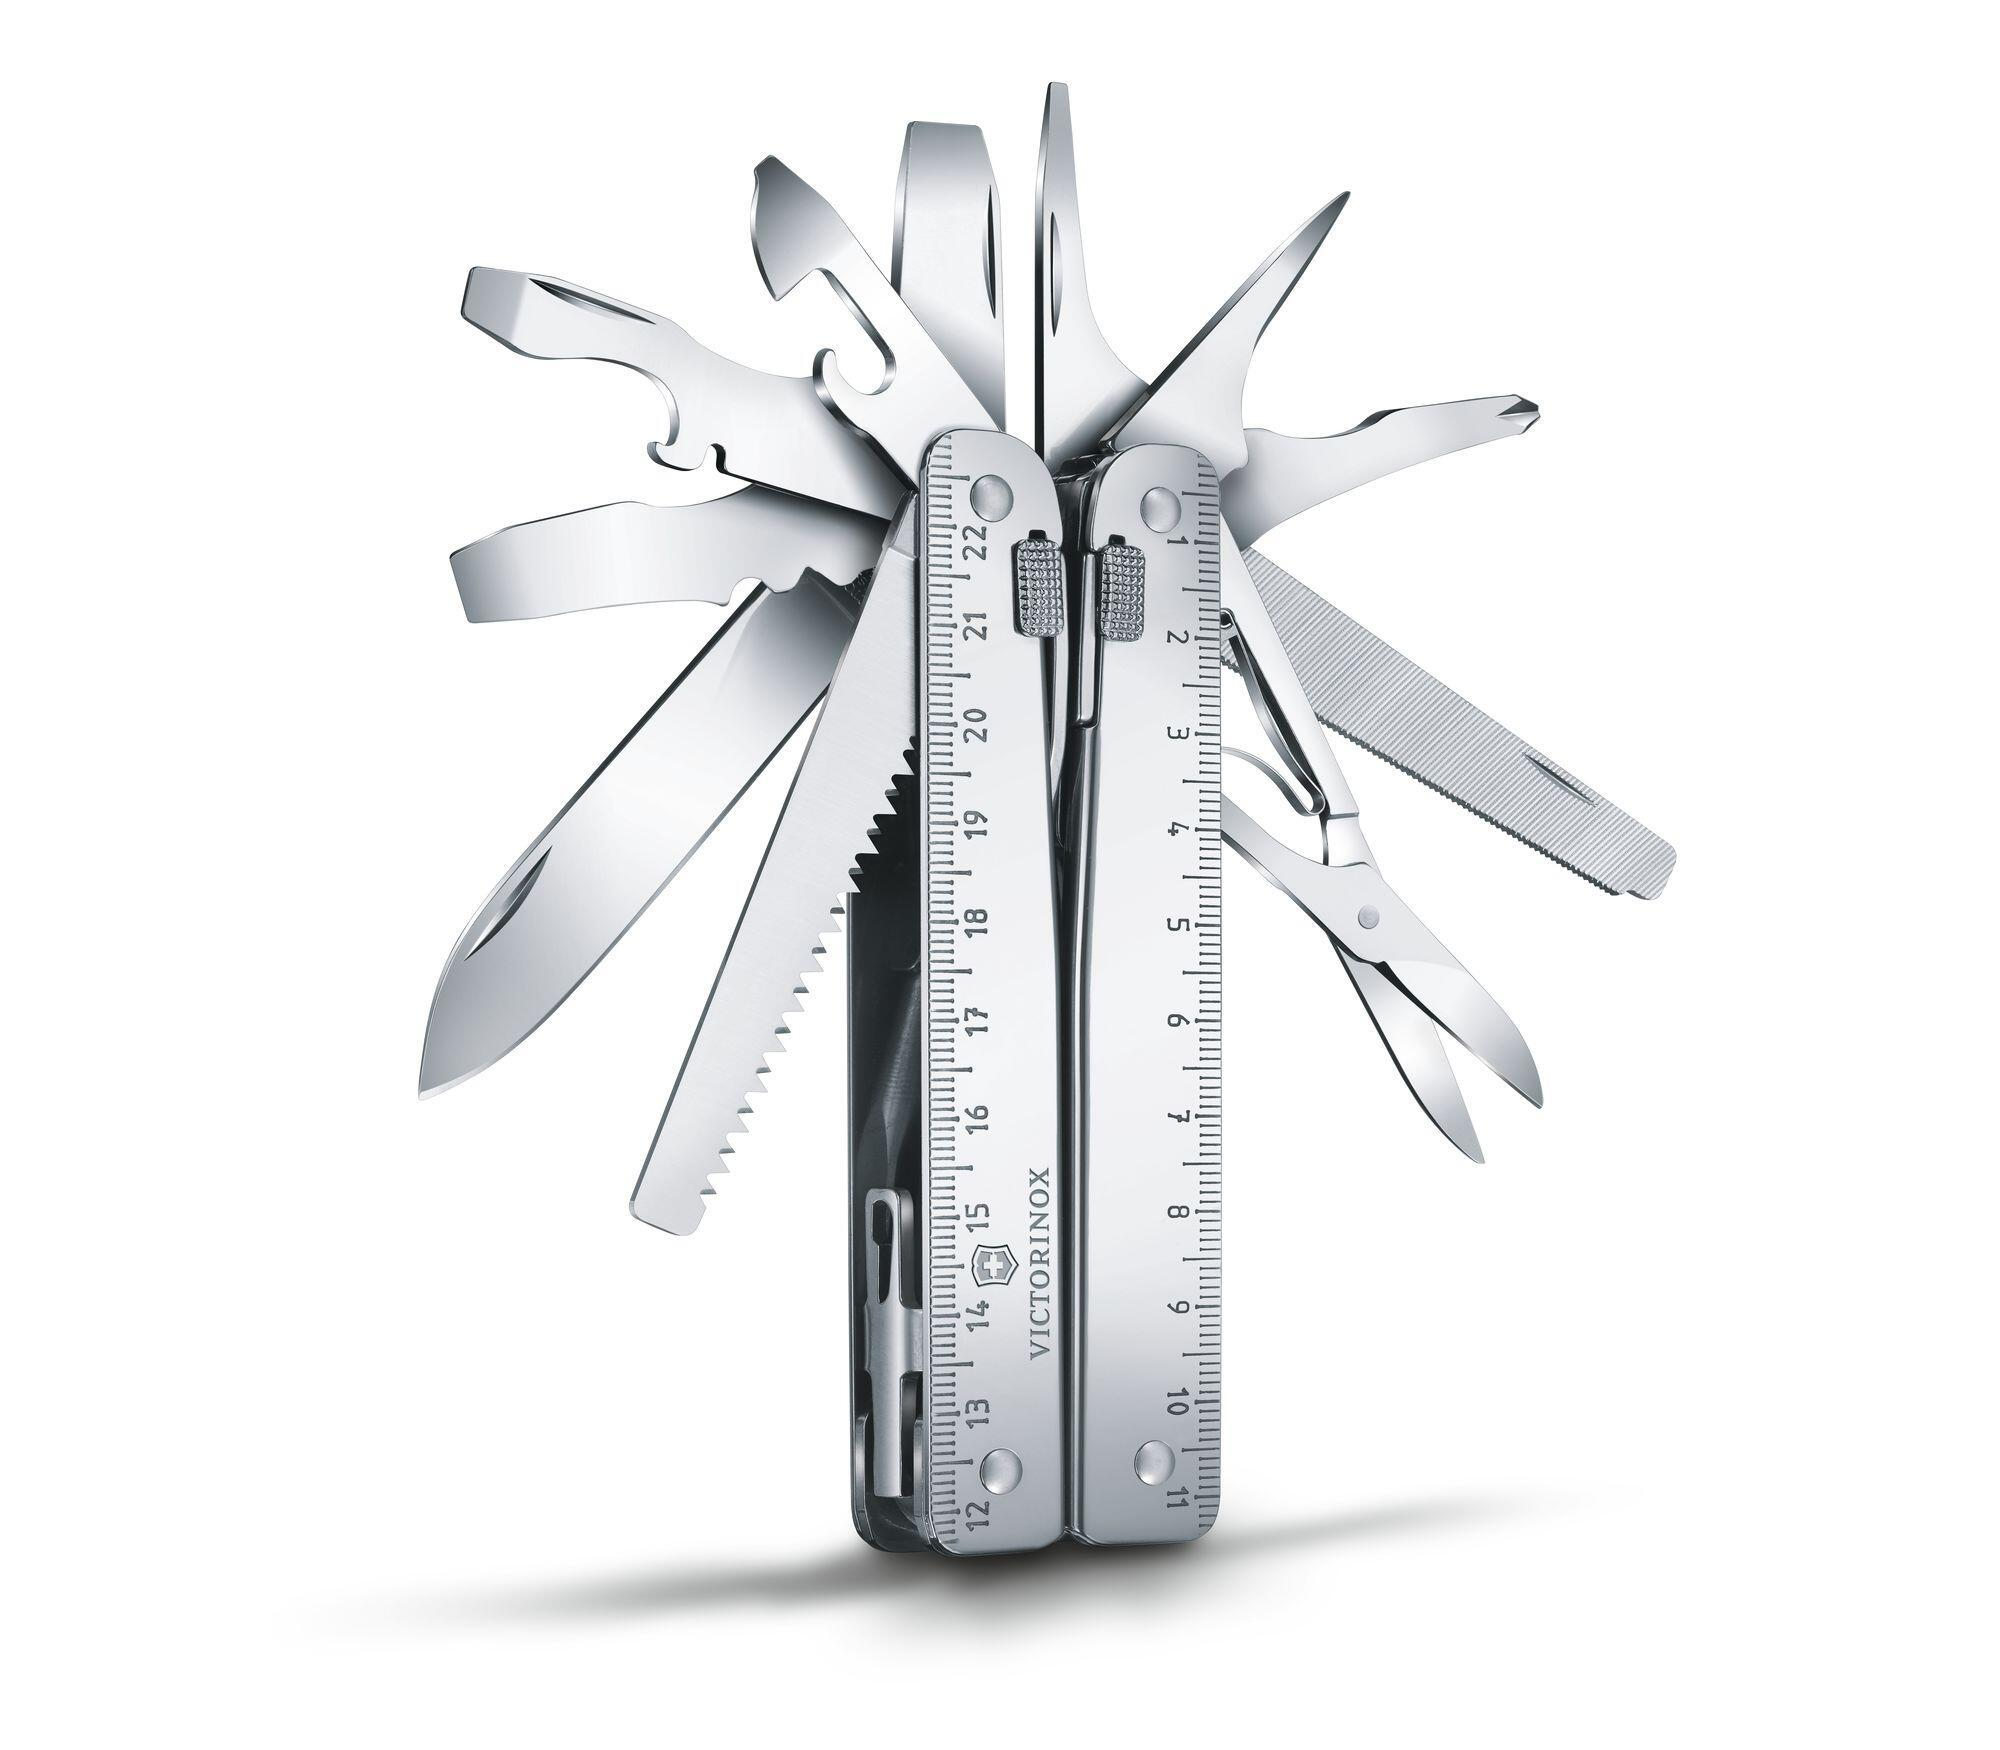 Victorinox SwissTool X Plus (3.0338.L)   купить в интернет-магазине Wenger-Victorinox.Ru